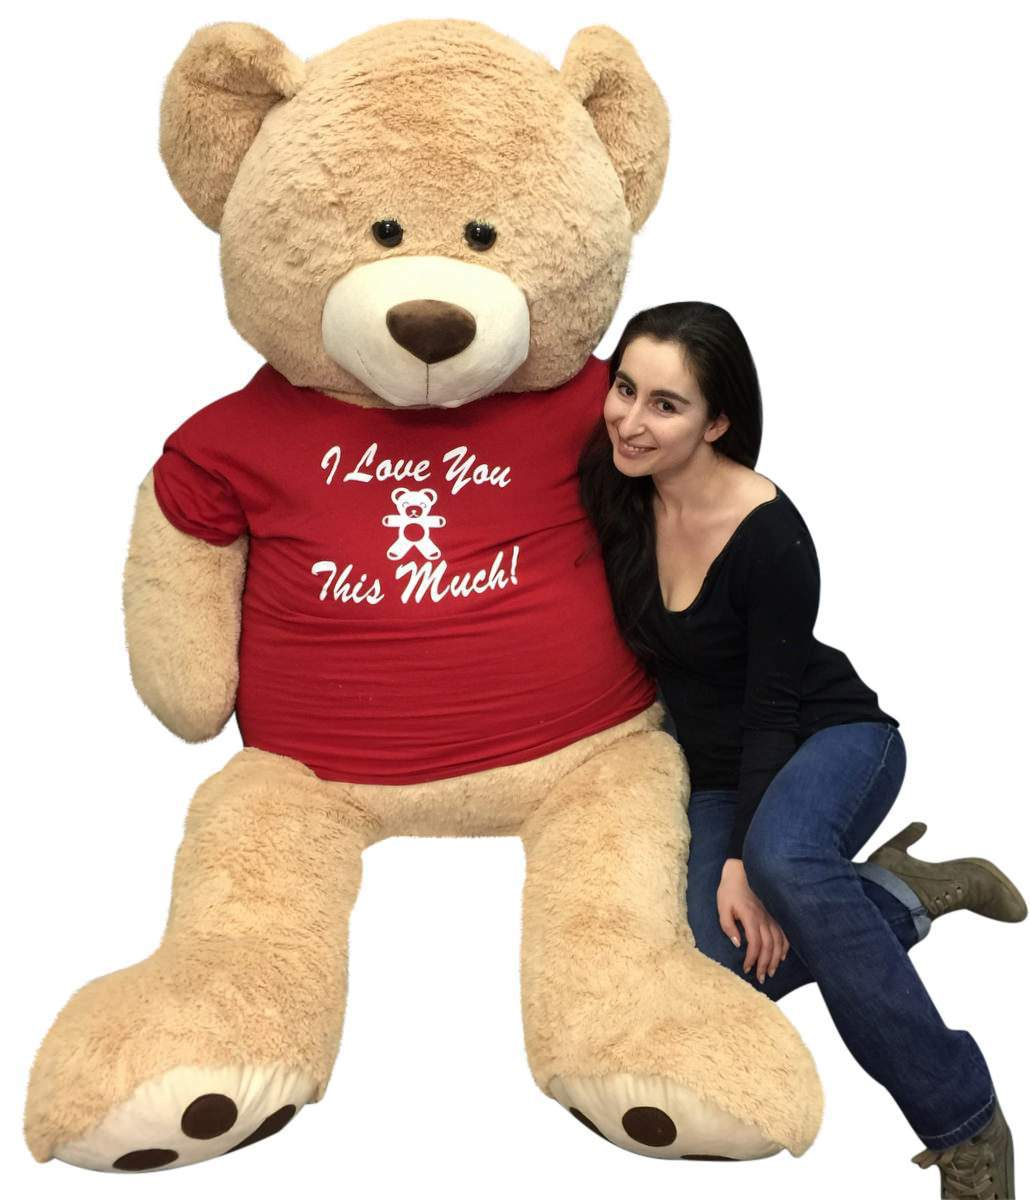 big plush giant 6 ft teddy bear soft tshirt says i love you this